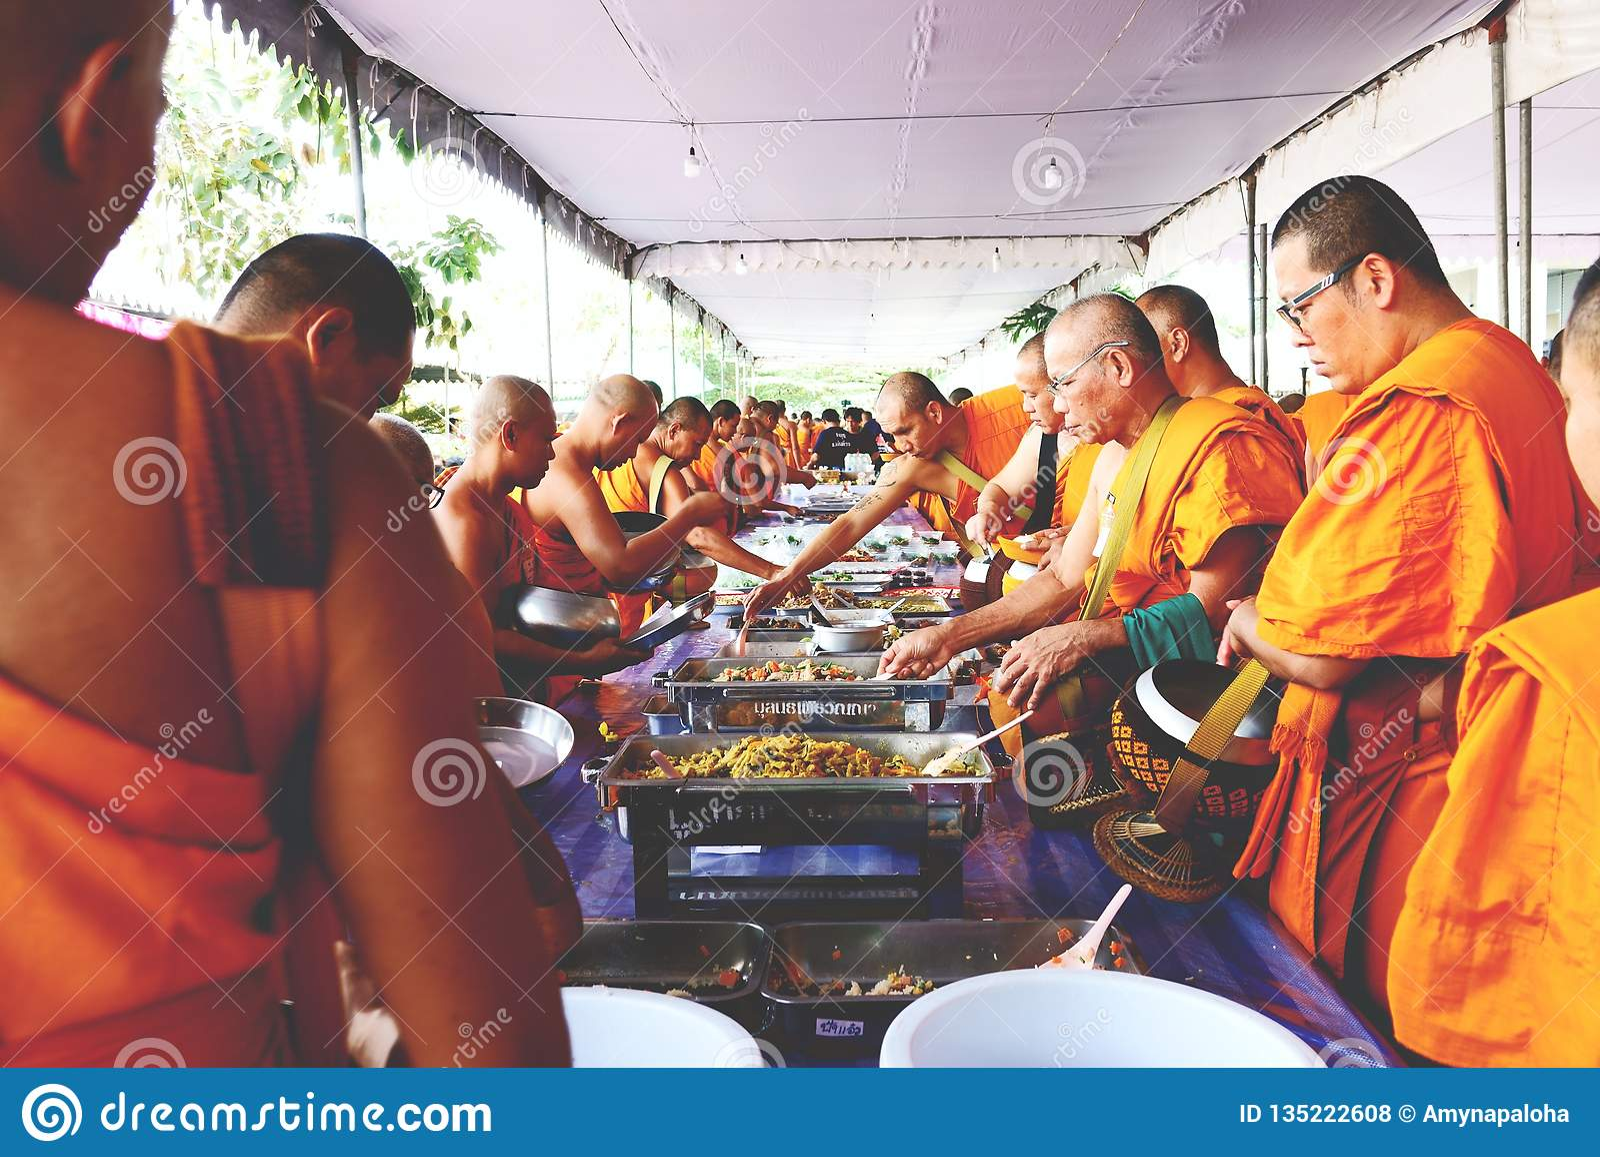 7 de diciembre de 2018, camino de Thep Khunakon, Na Mueang, Chachoengsao, Tailandia, limosnas del recept de los monjes en la univ